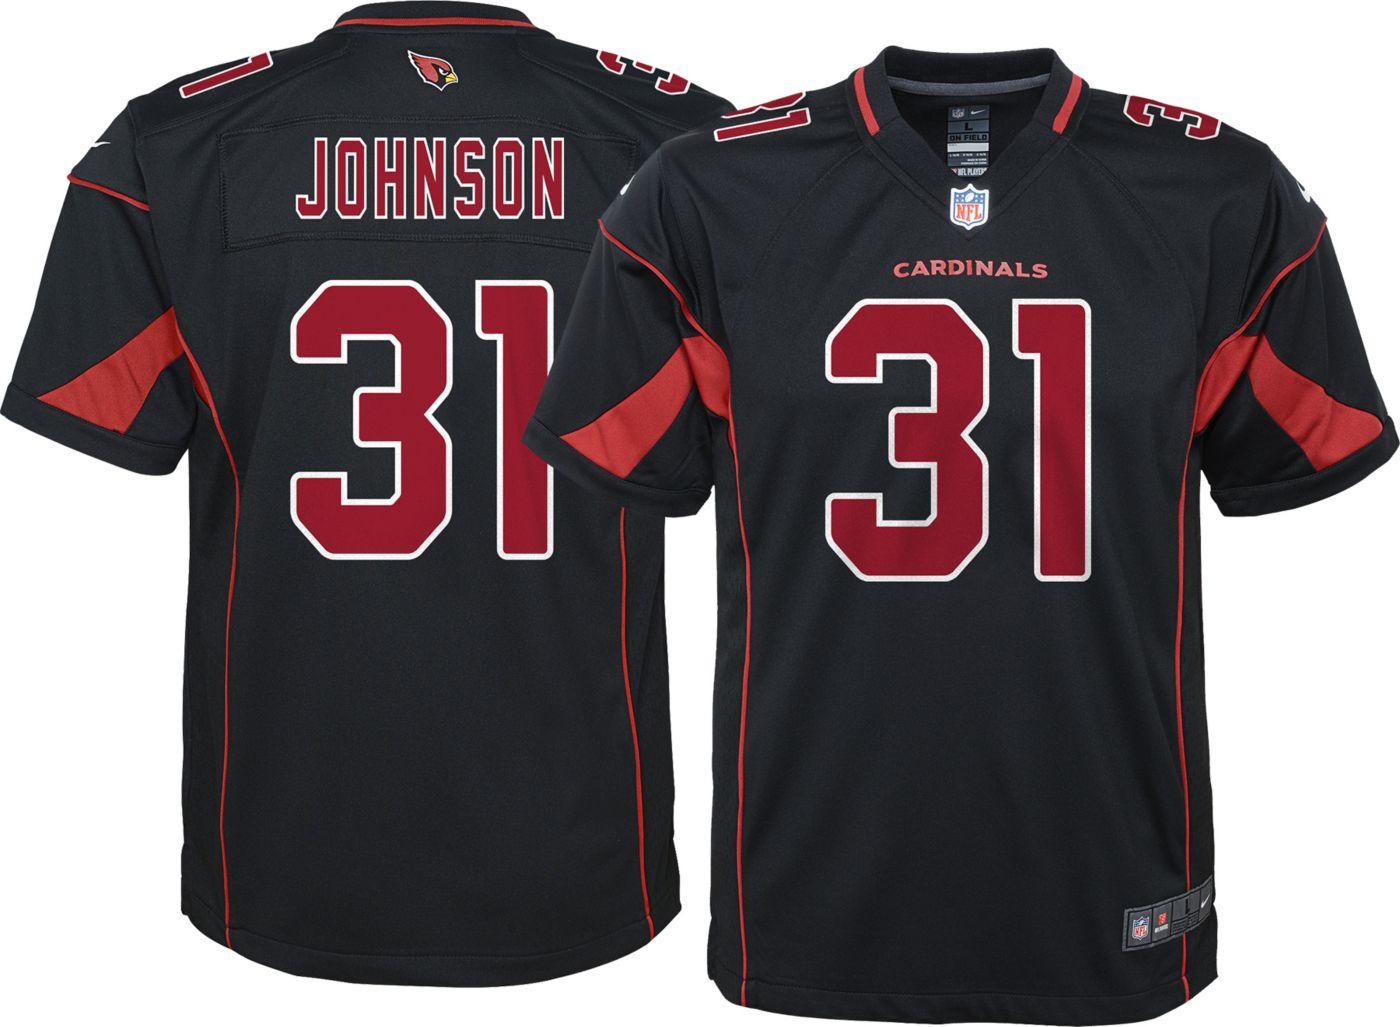 Nike Youth Color Rush Game Jersey Arizona Cardinals David Johnson #31